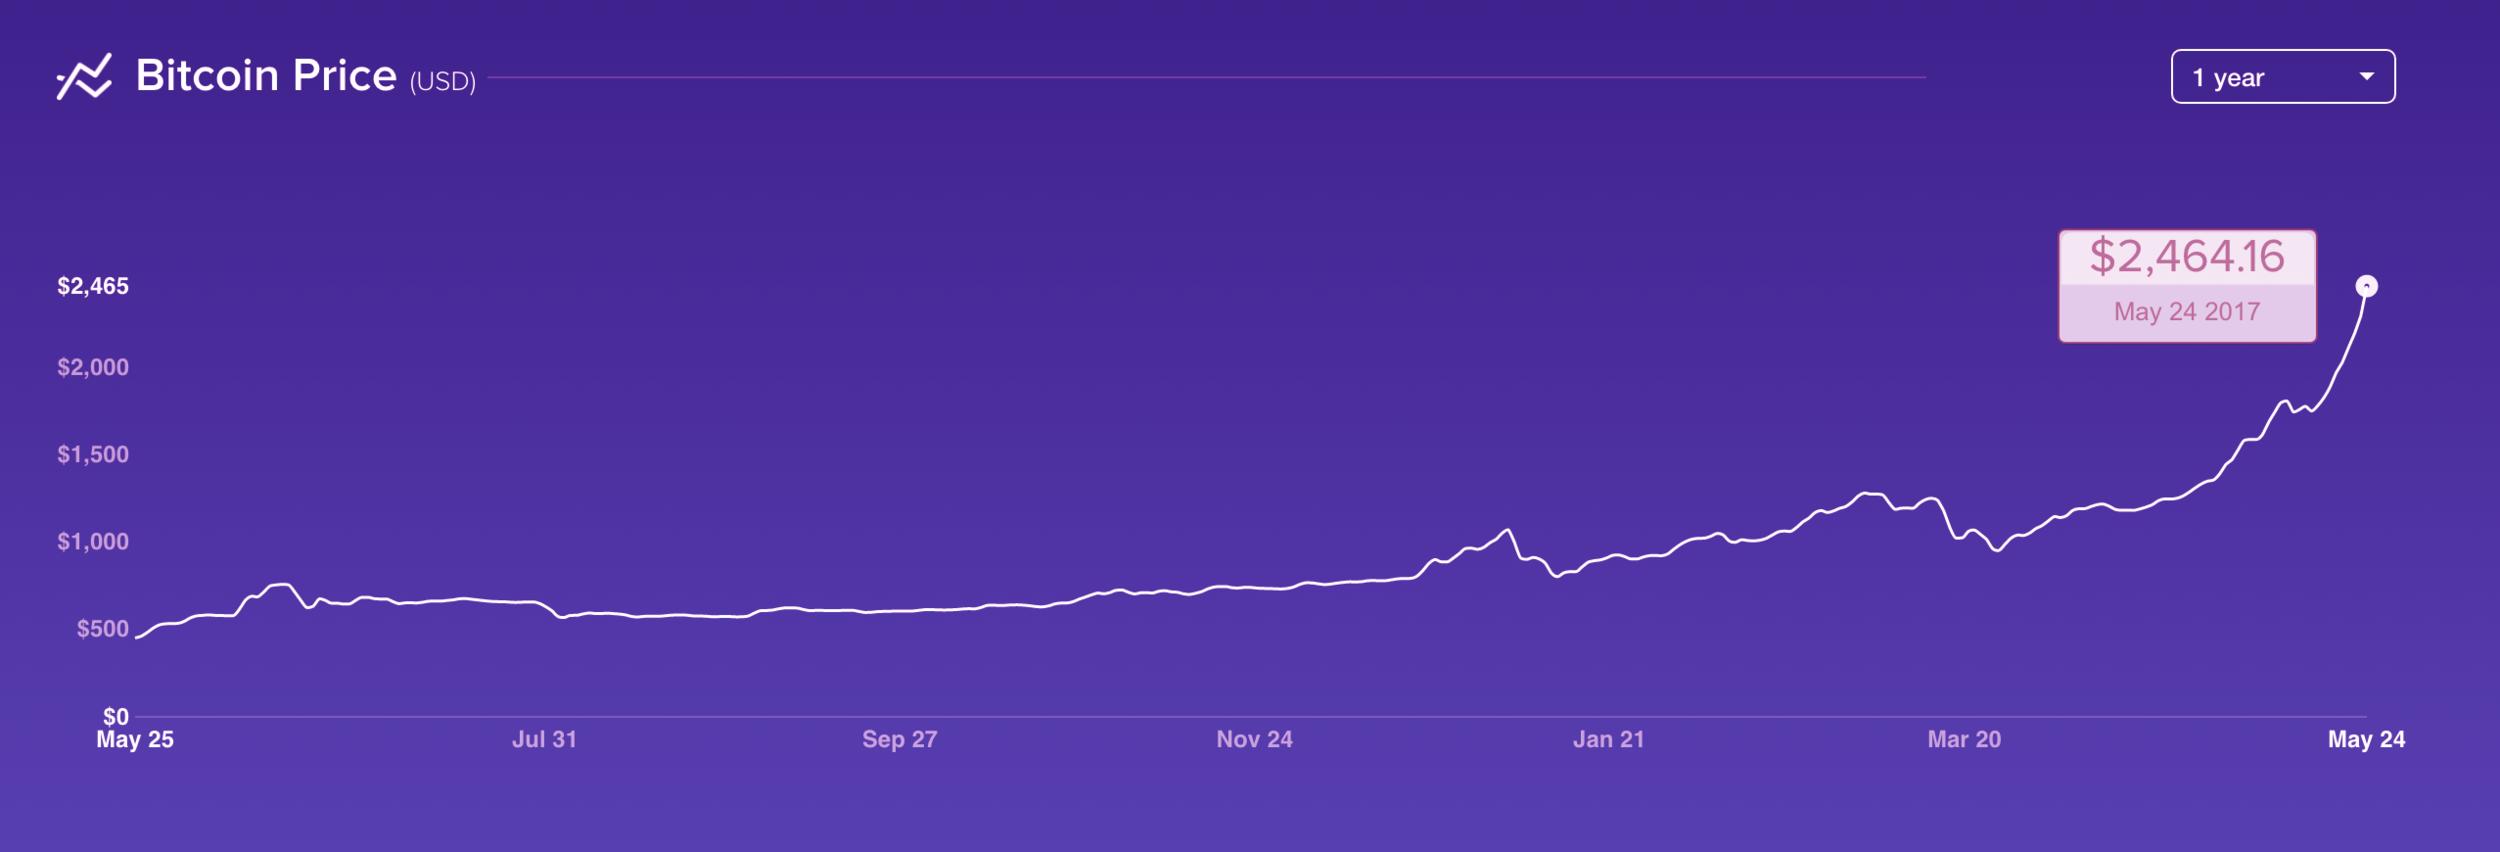 Original graph from Coinbase.